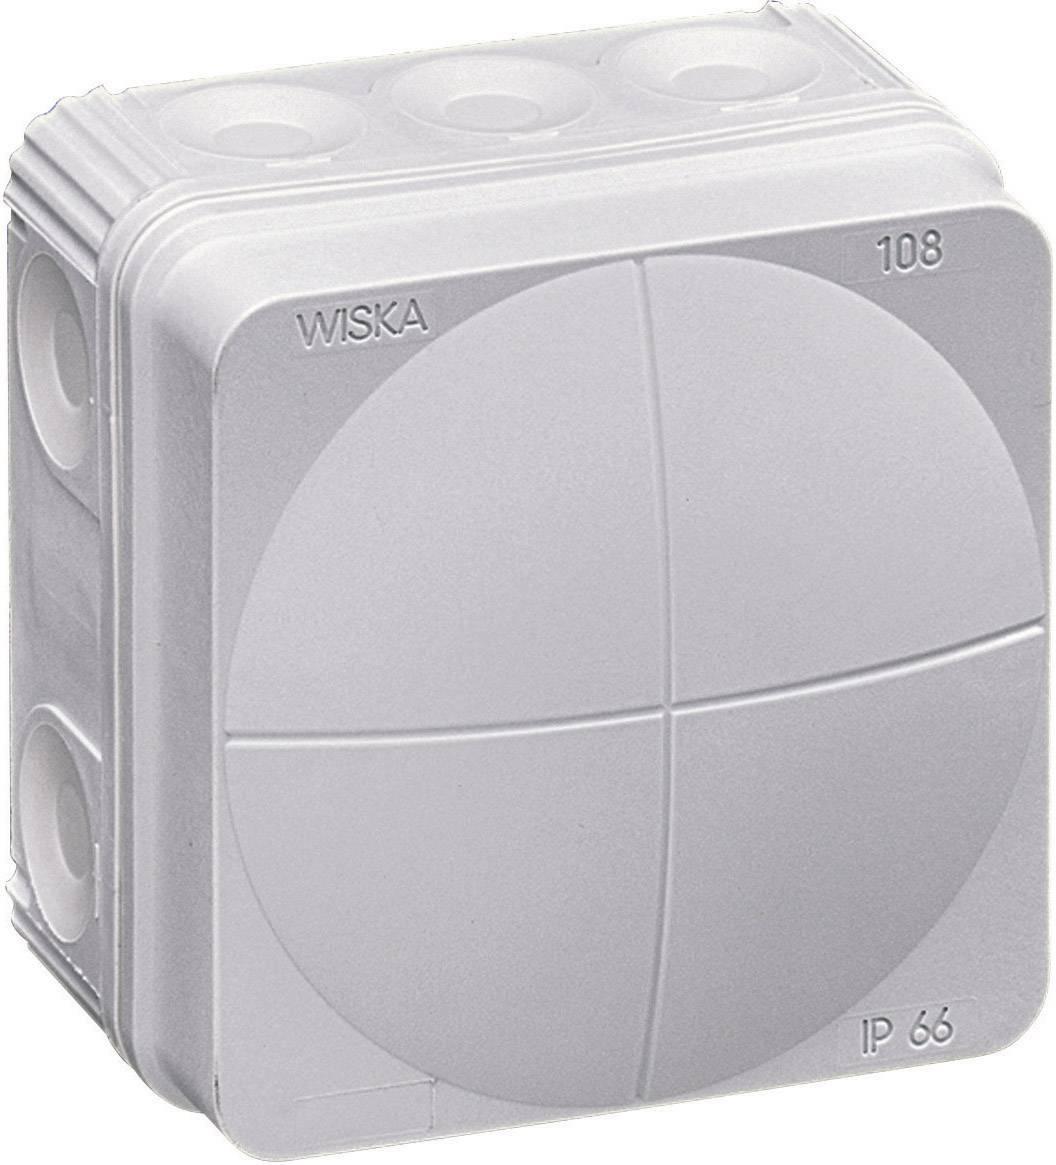 Rozbočovací krabice Wiska Combi 108, IP66, šedá, 10060522